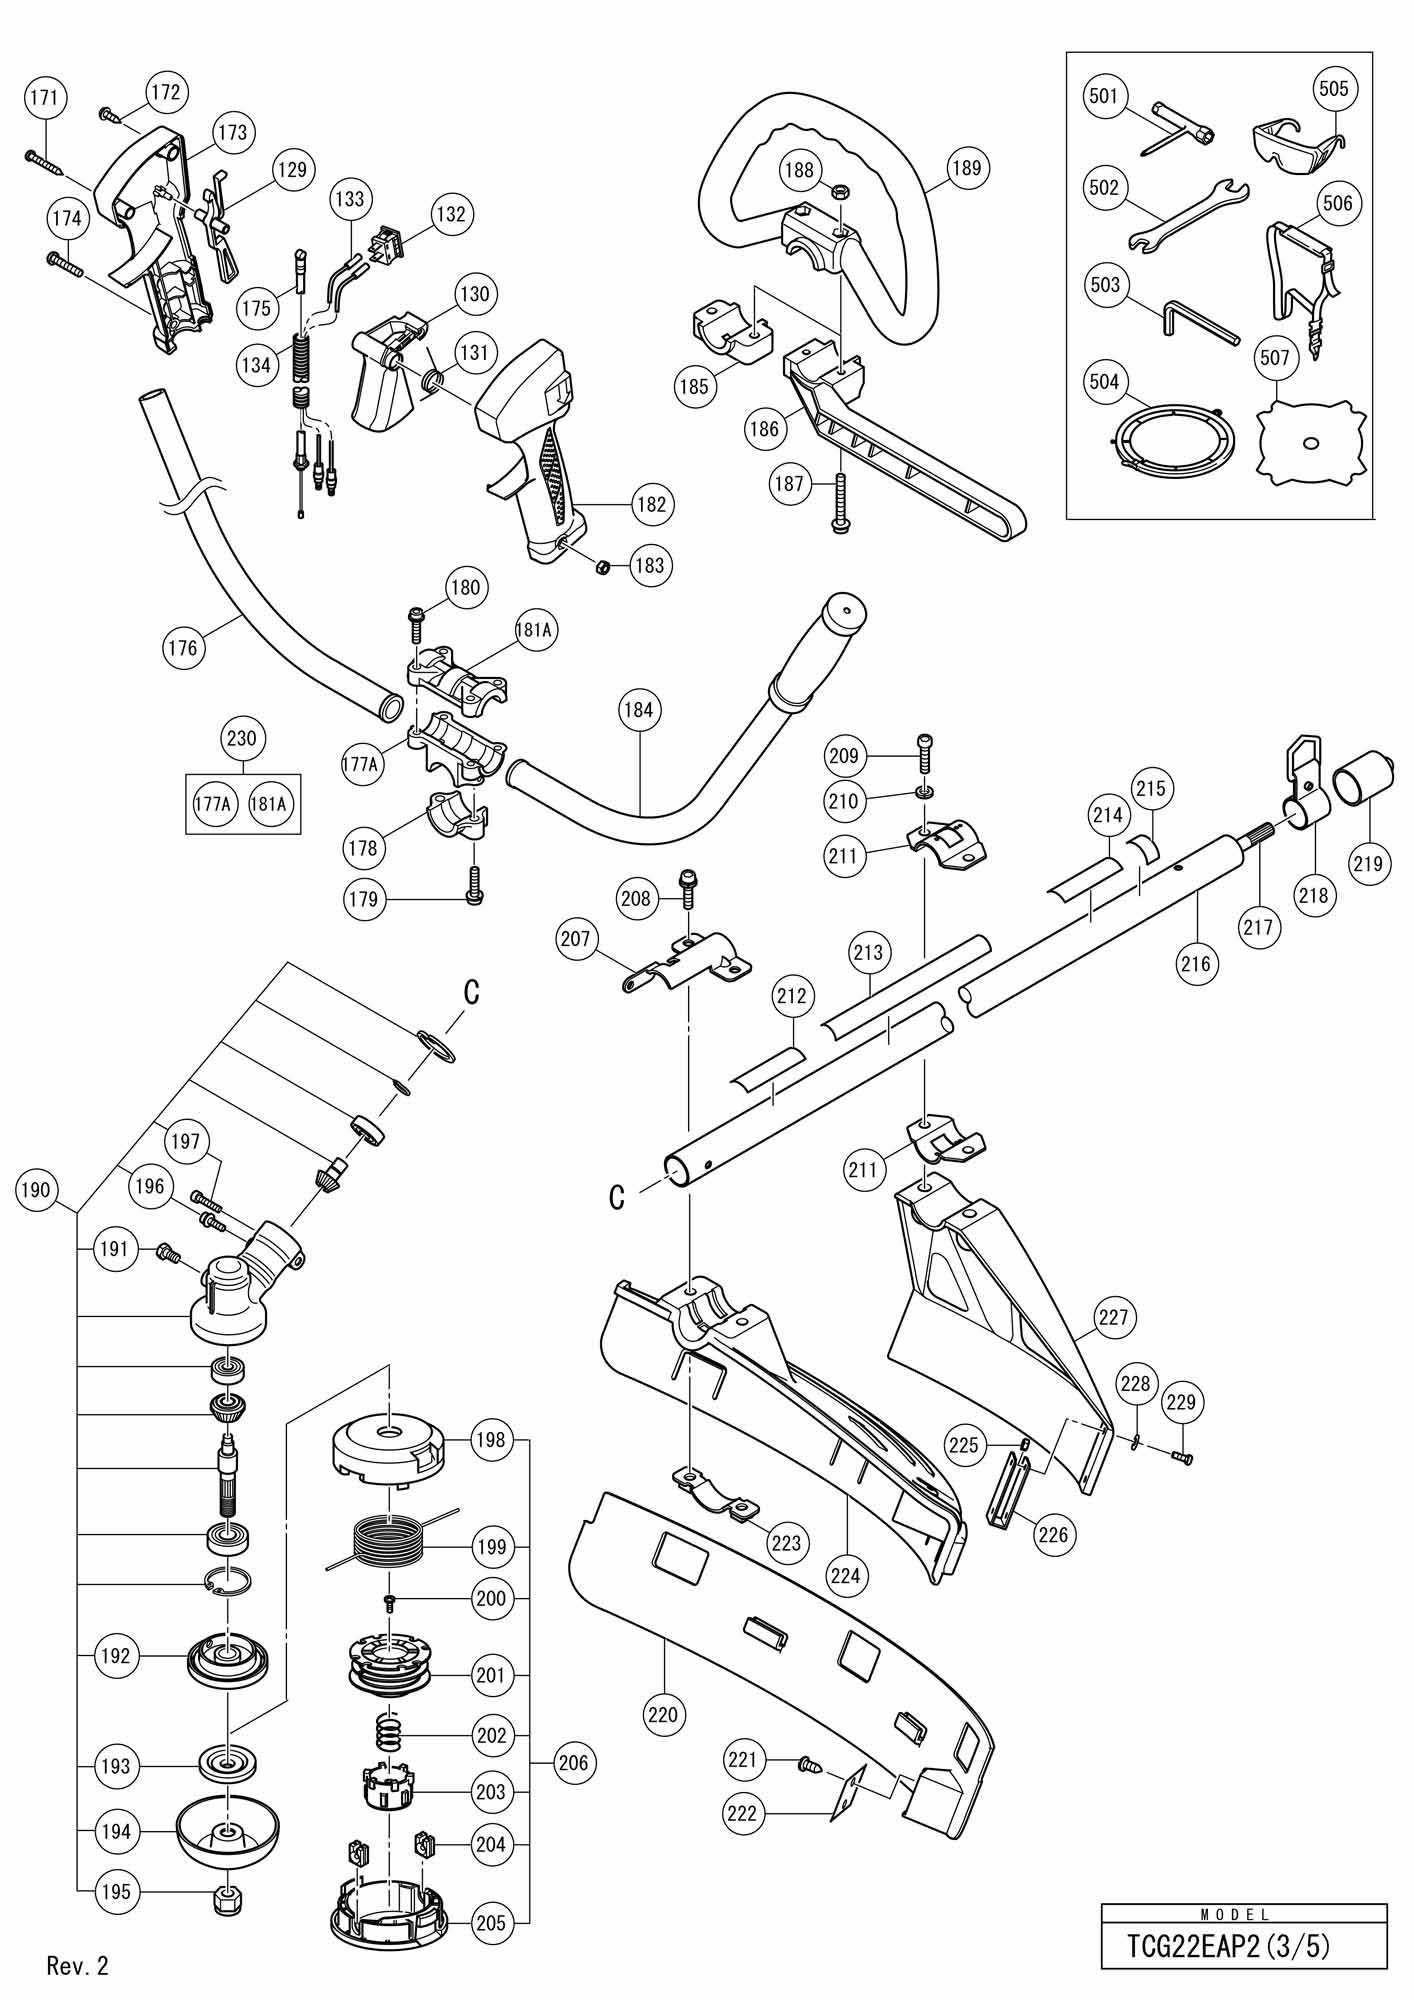 Hitachi Engine Grass Trimmer Tcg 22eap2 SPARE_TCG22EAP2